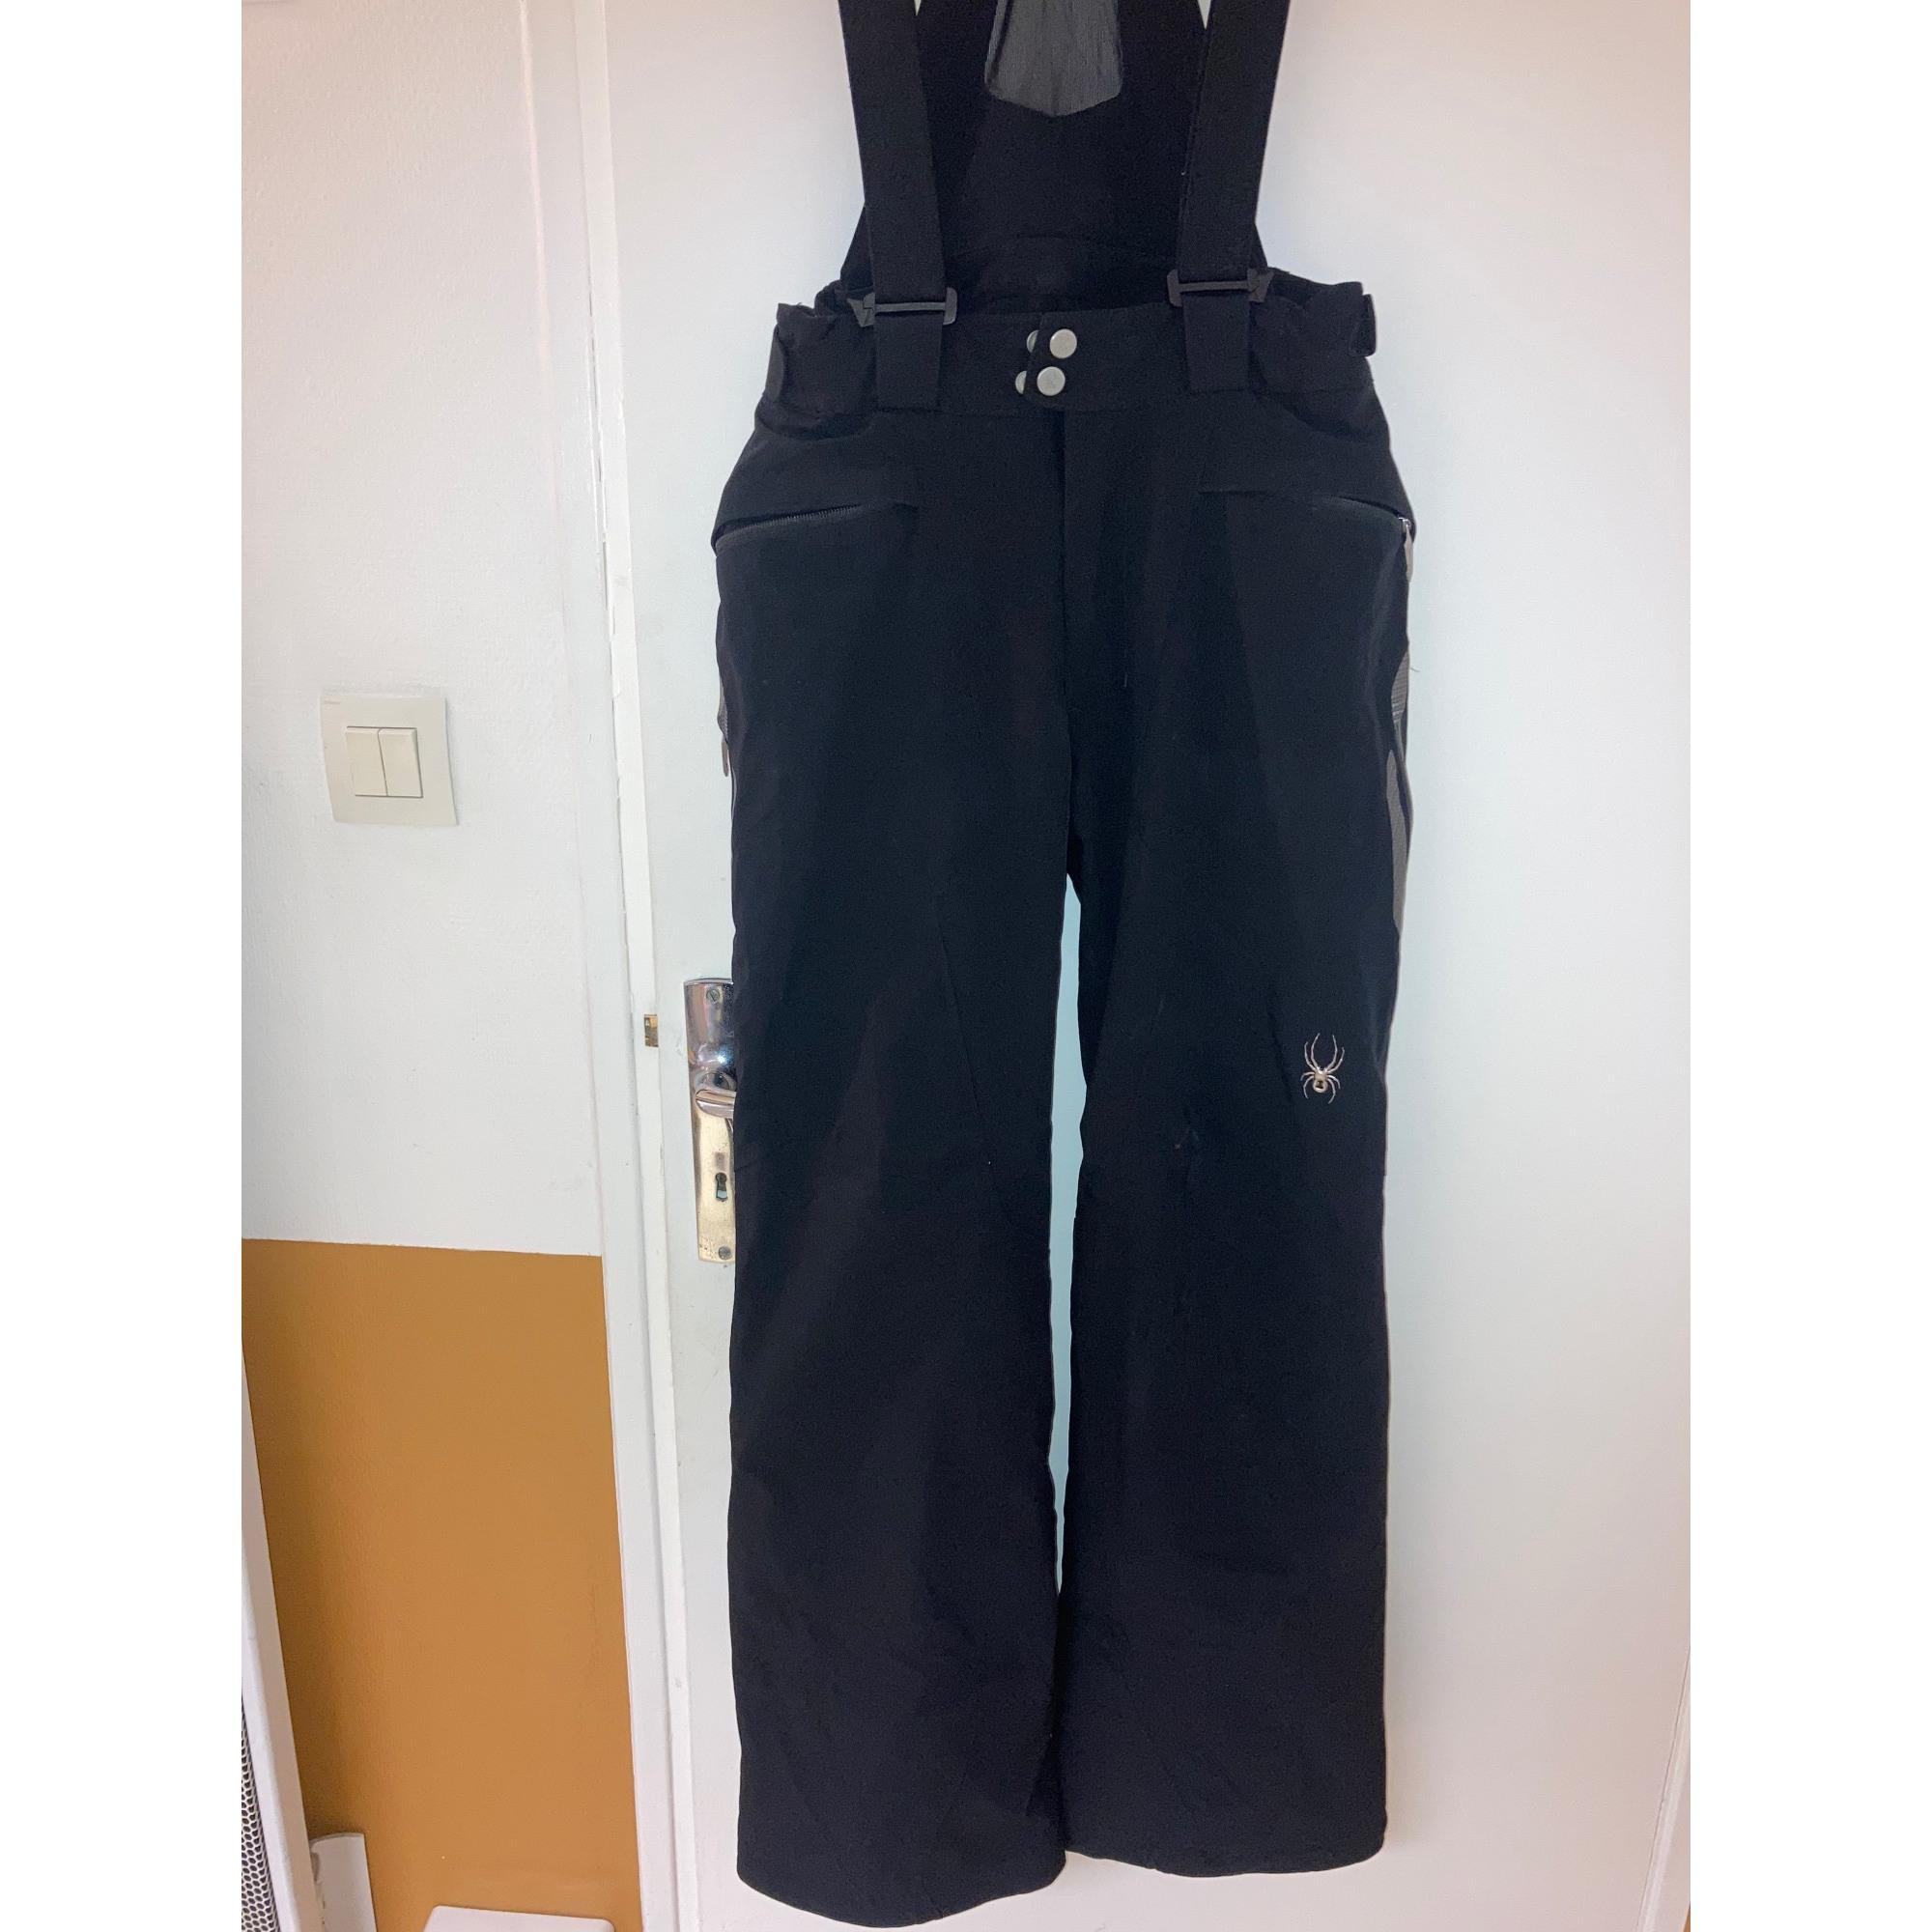 Pantalon de ski SPYDER Noir